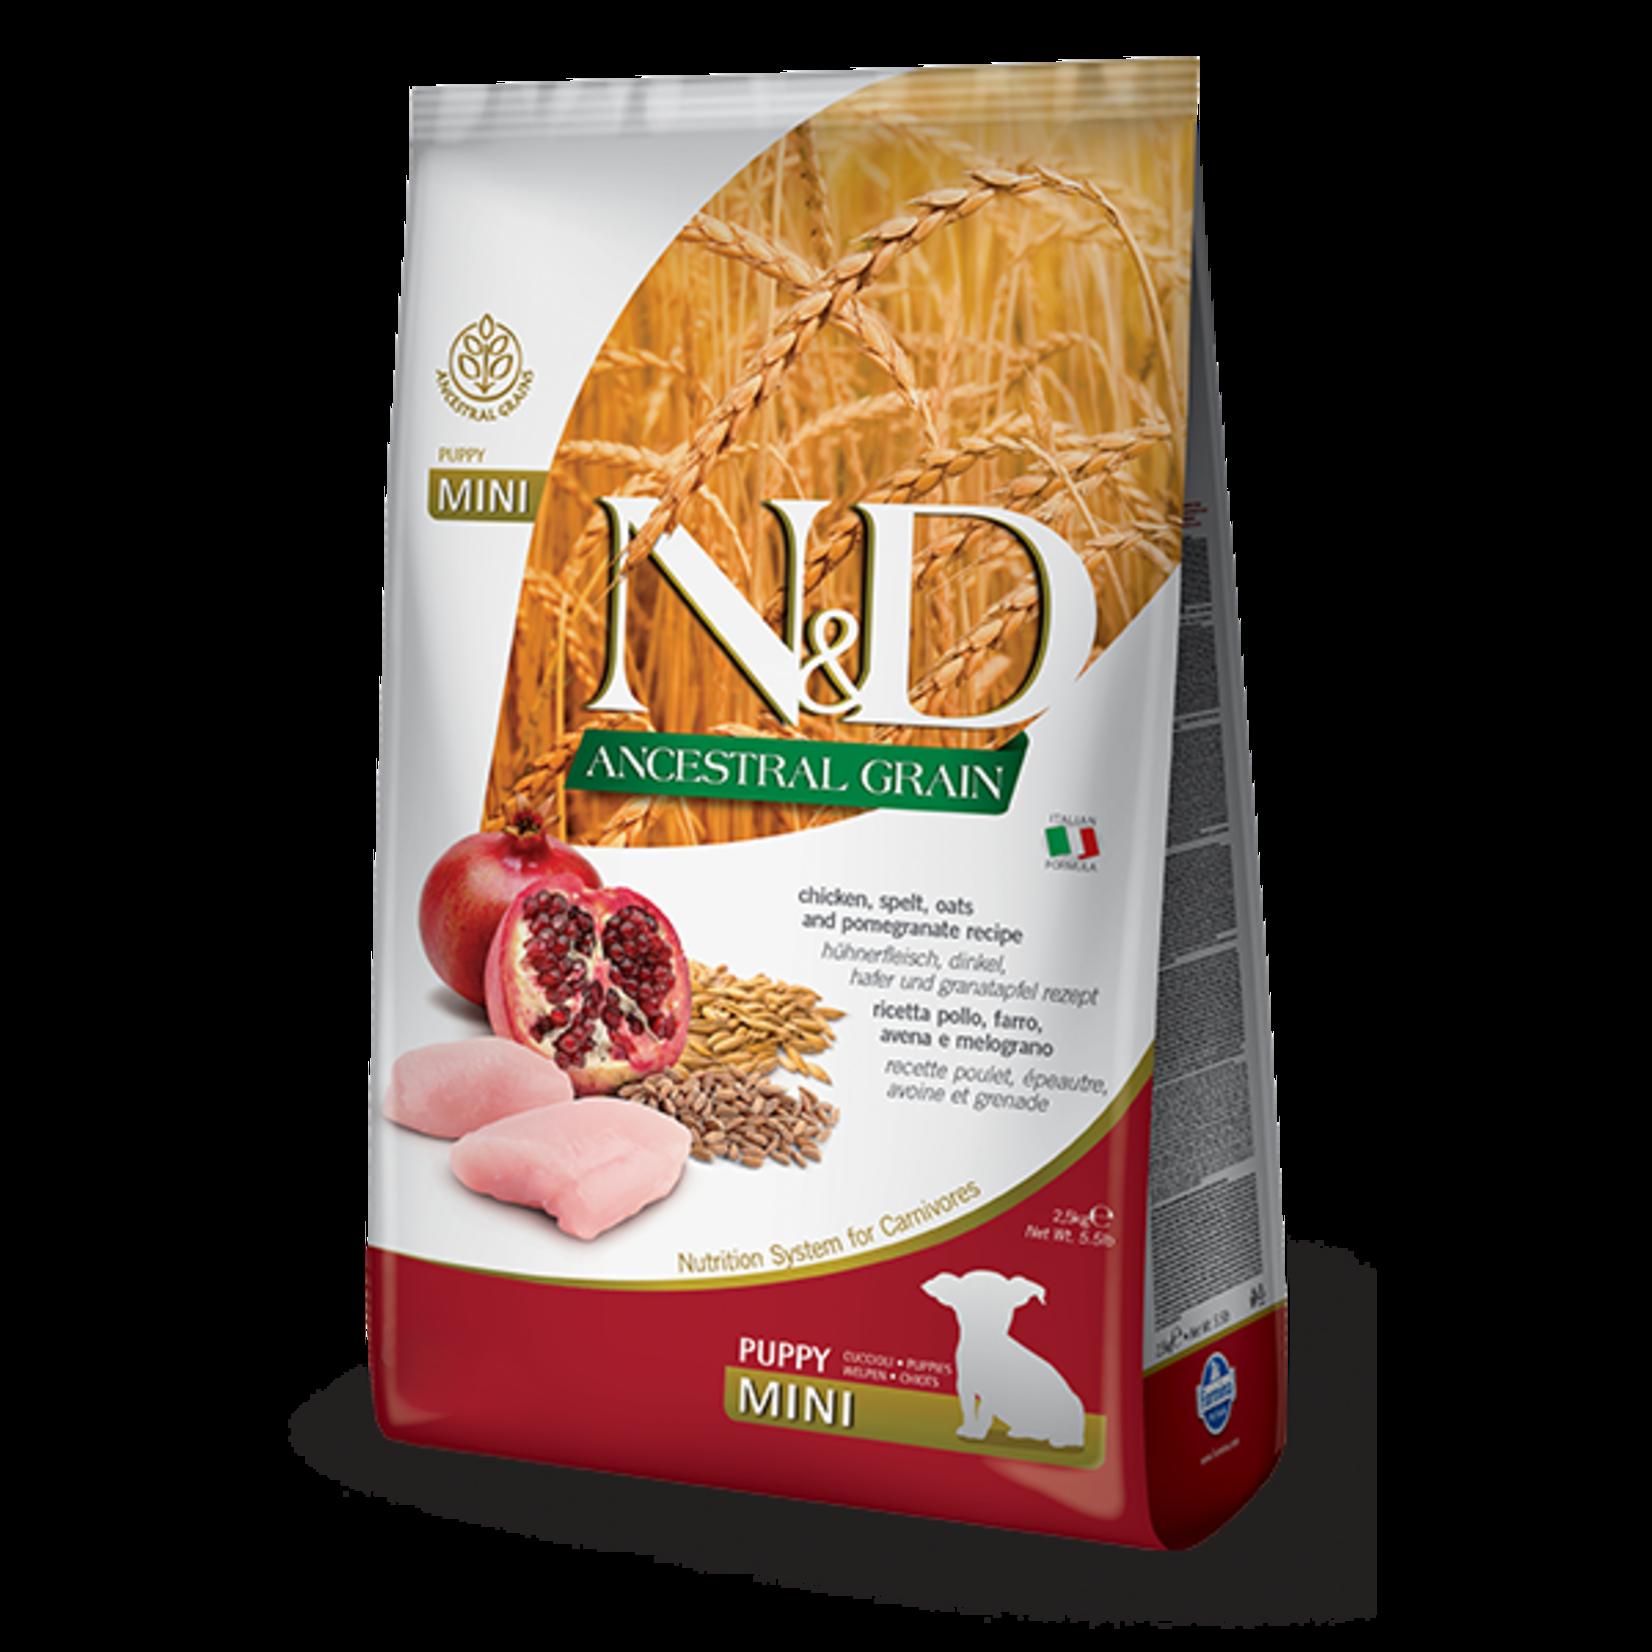 Farmina Farmina Ancestral Grain Chicken & Pomegranate Puppy Food